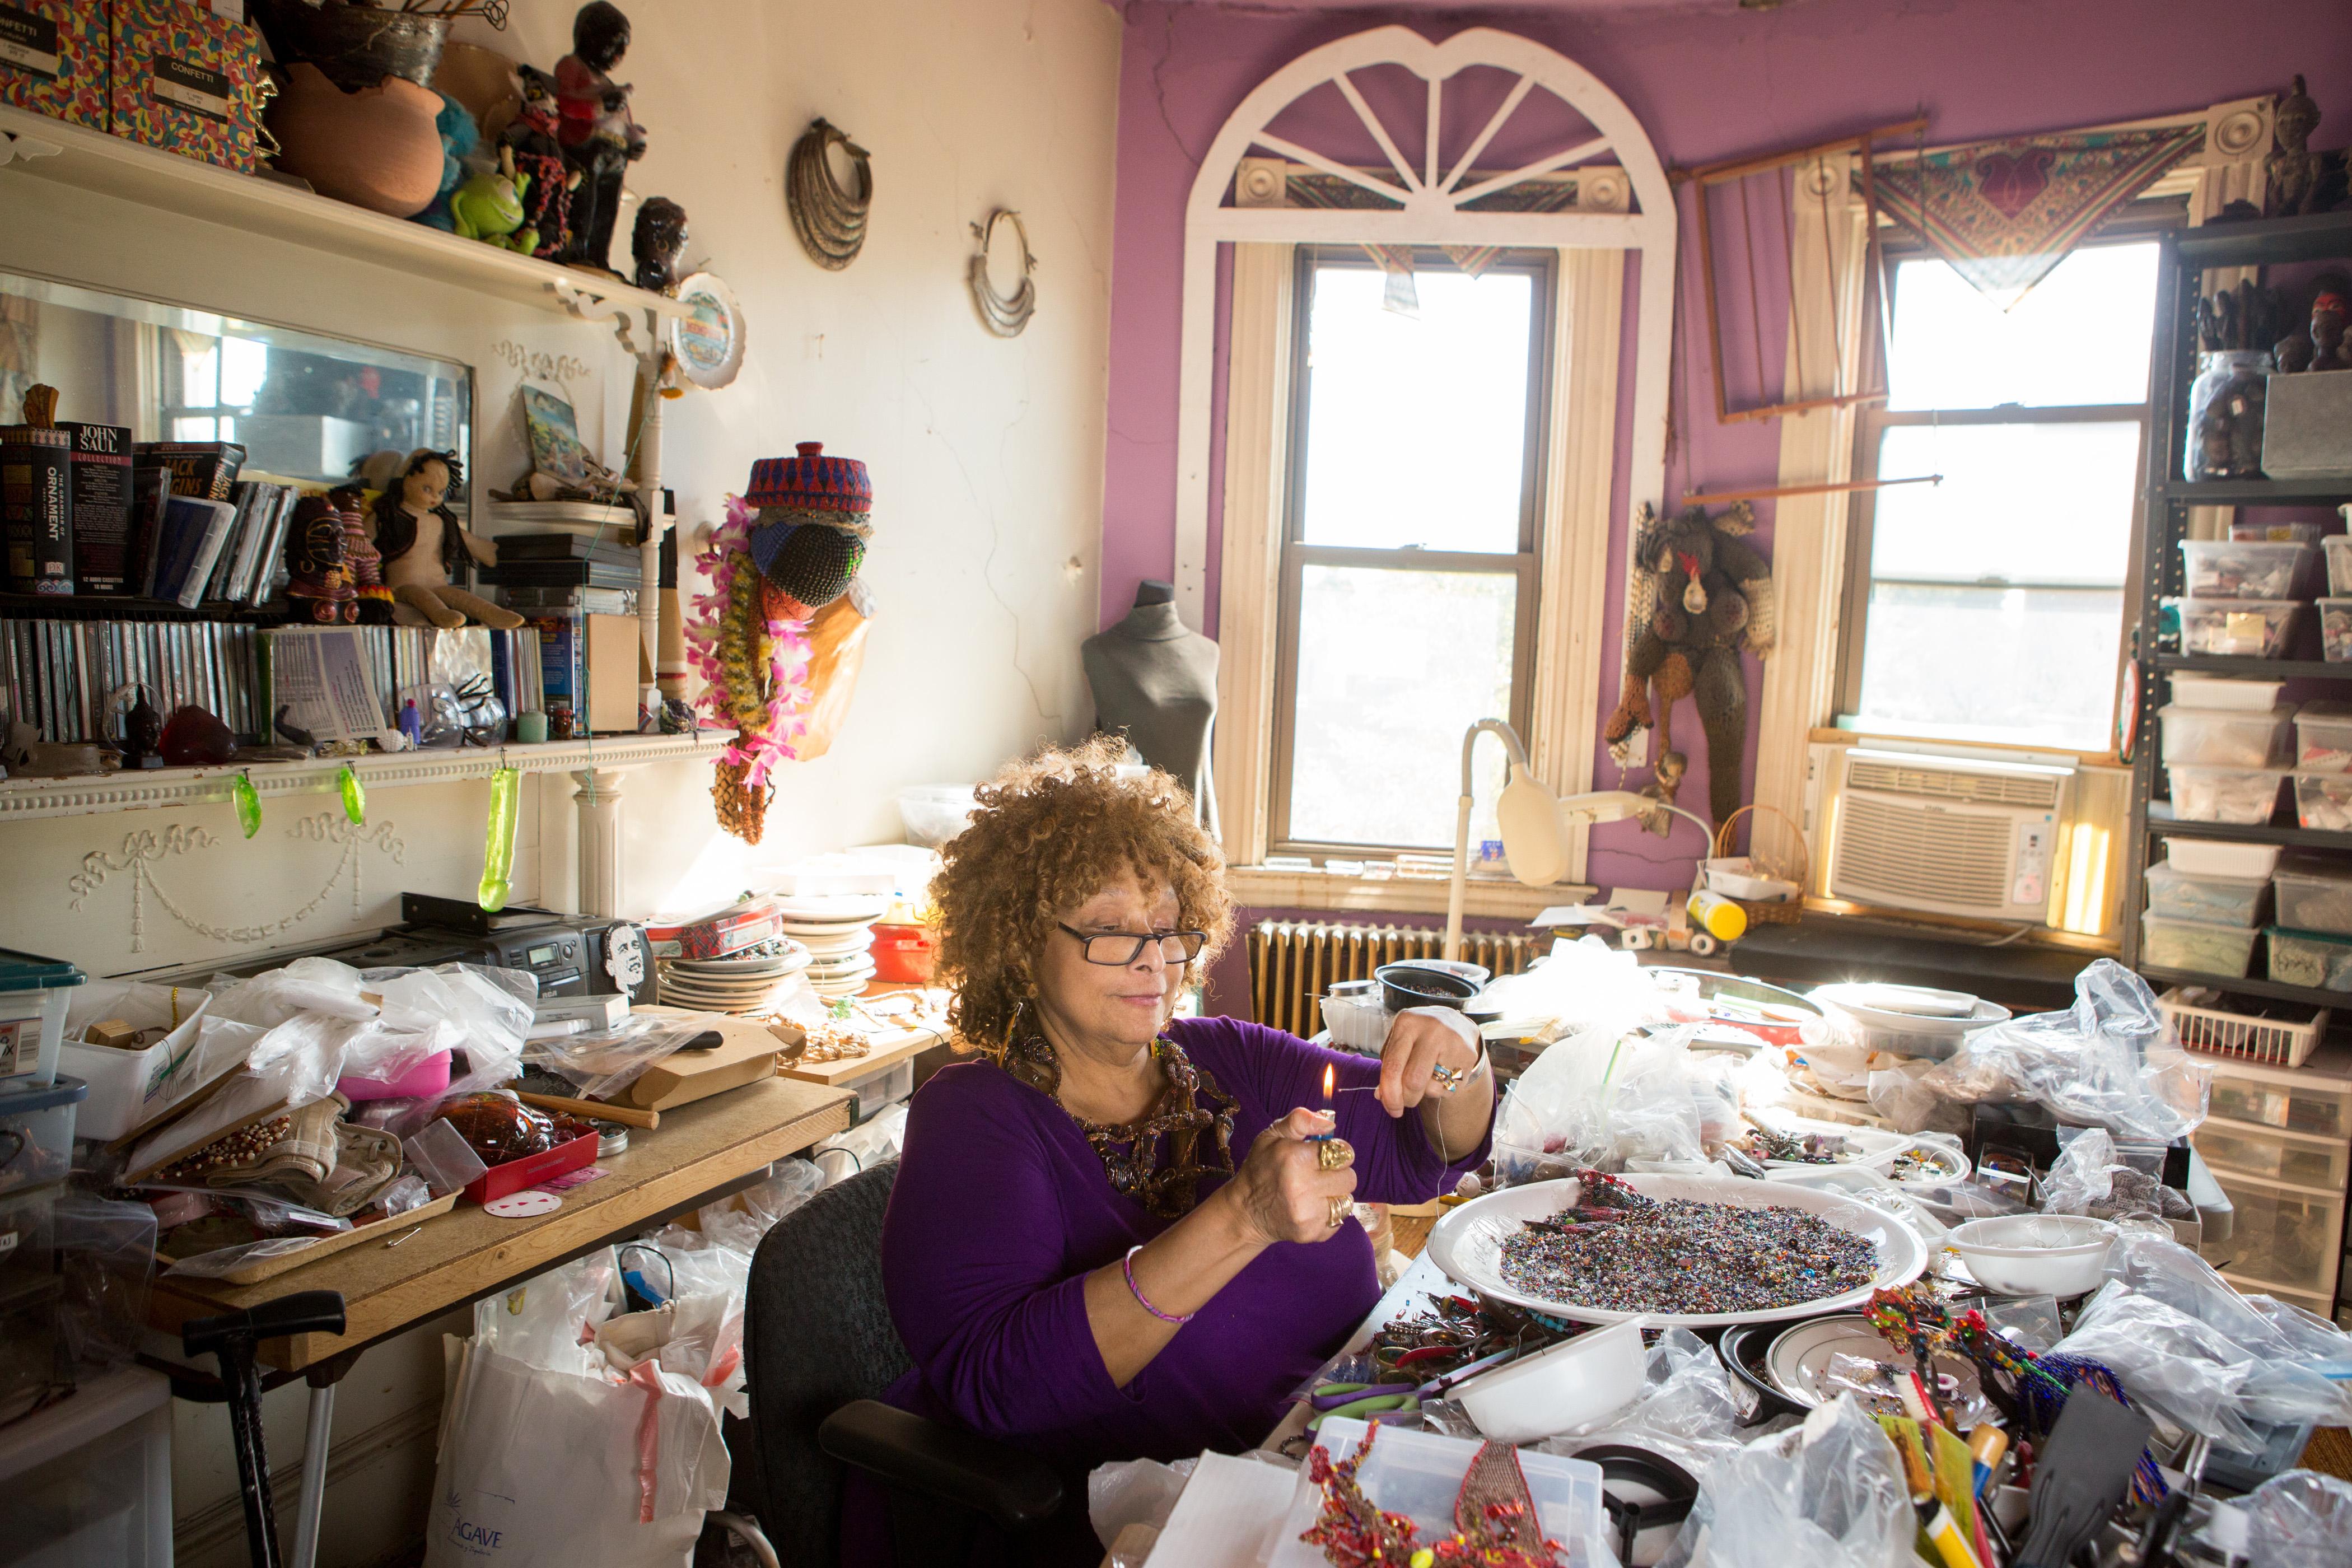 Artist Joyce J. Scott at her home in Baltimore, Maryland, Monday, September 12, 2016